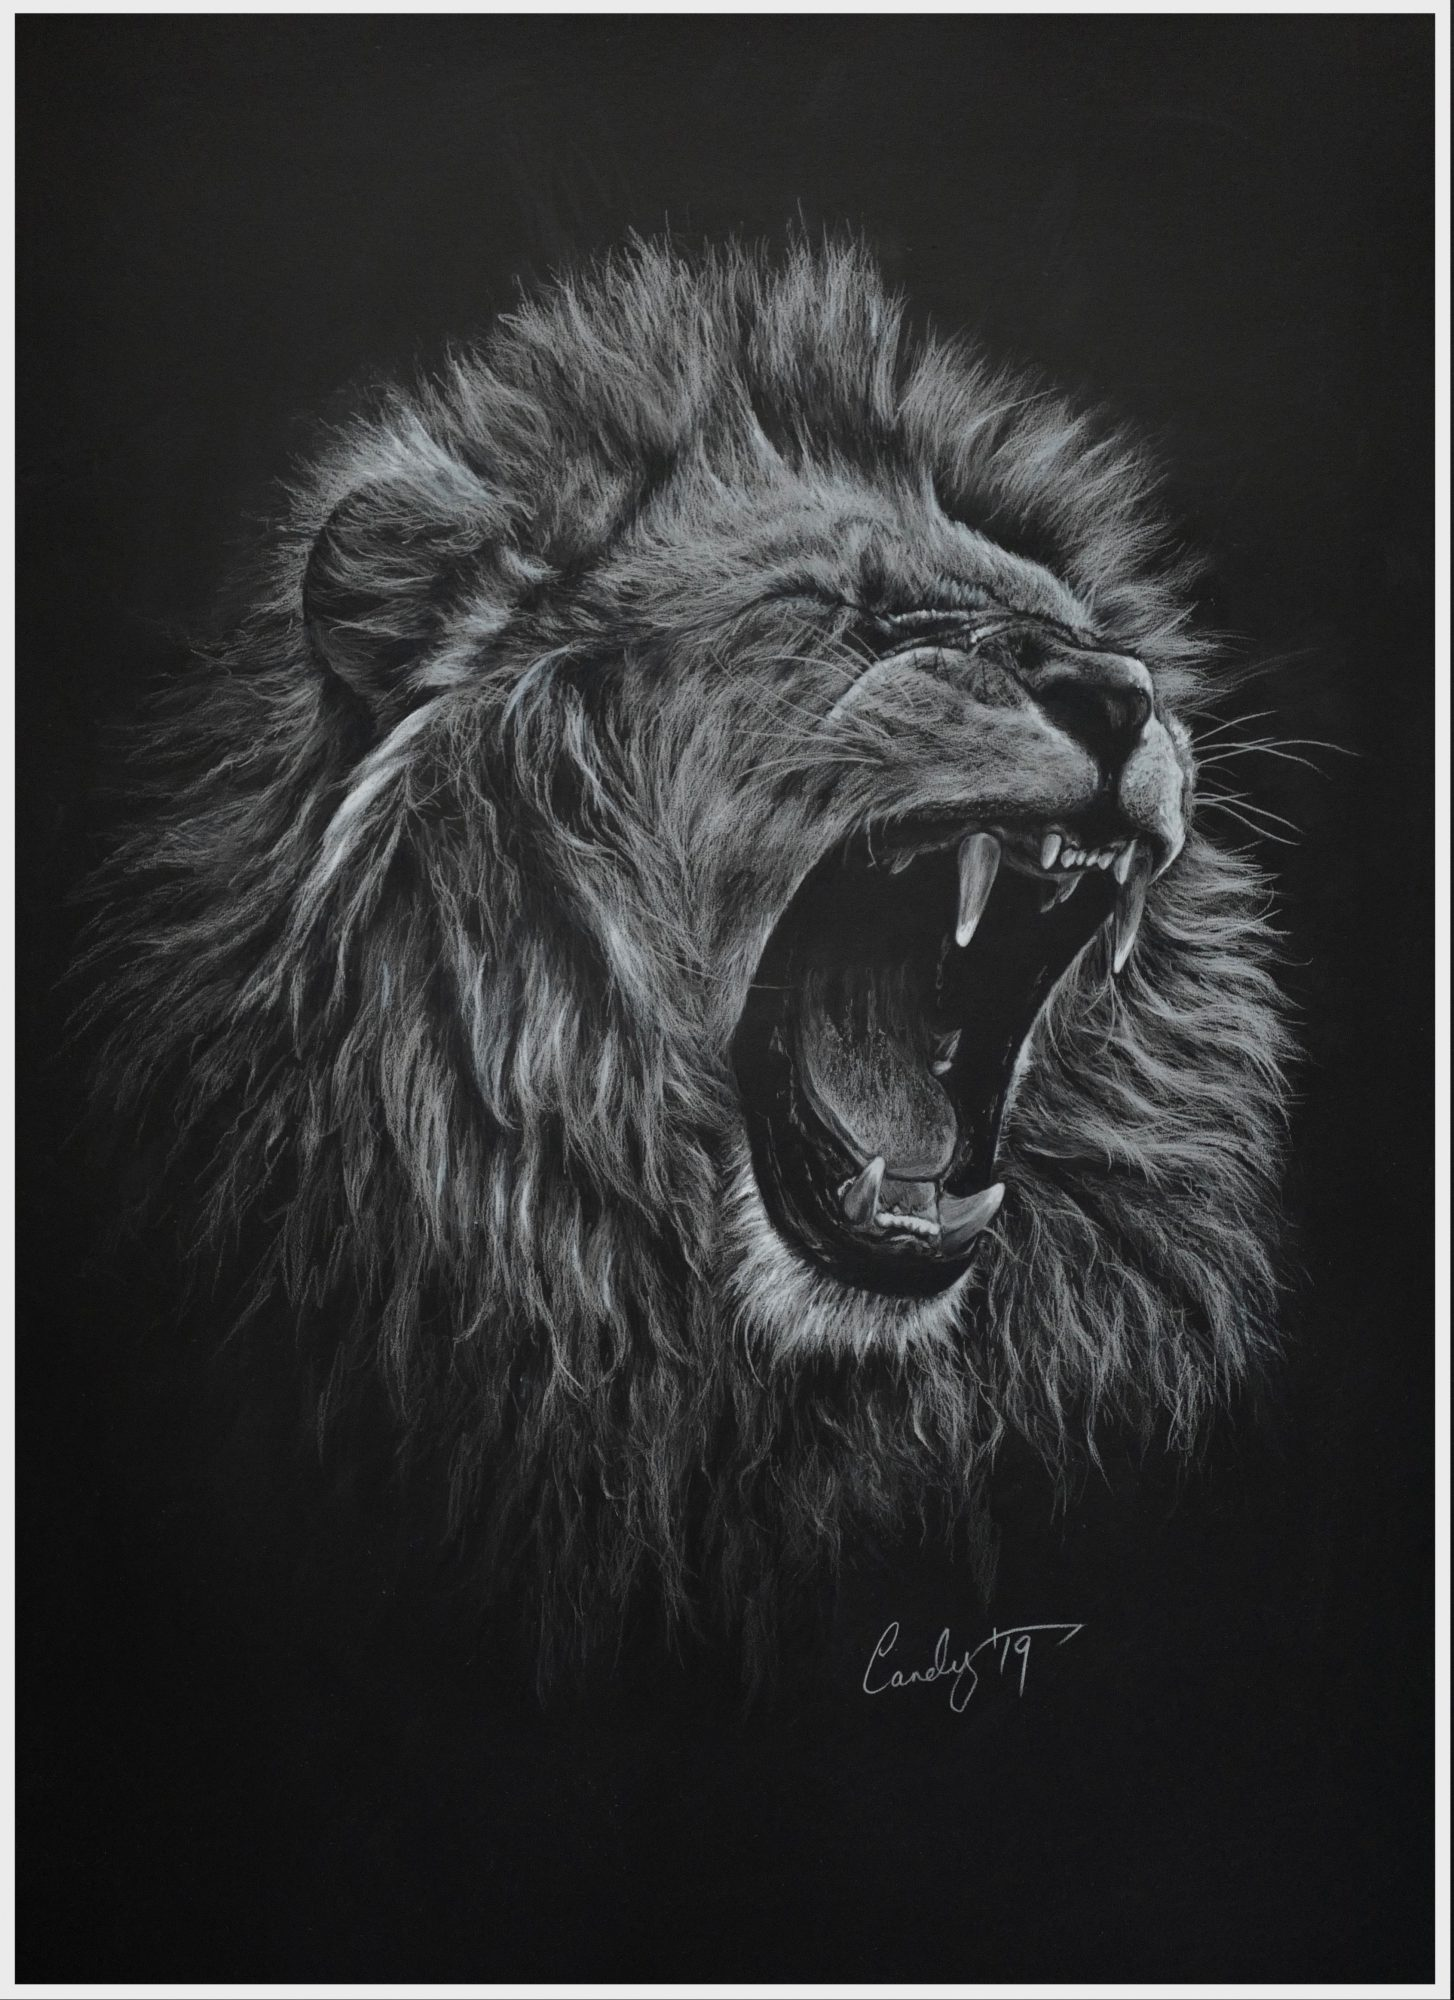 Lionroarborder